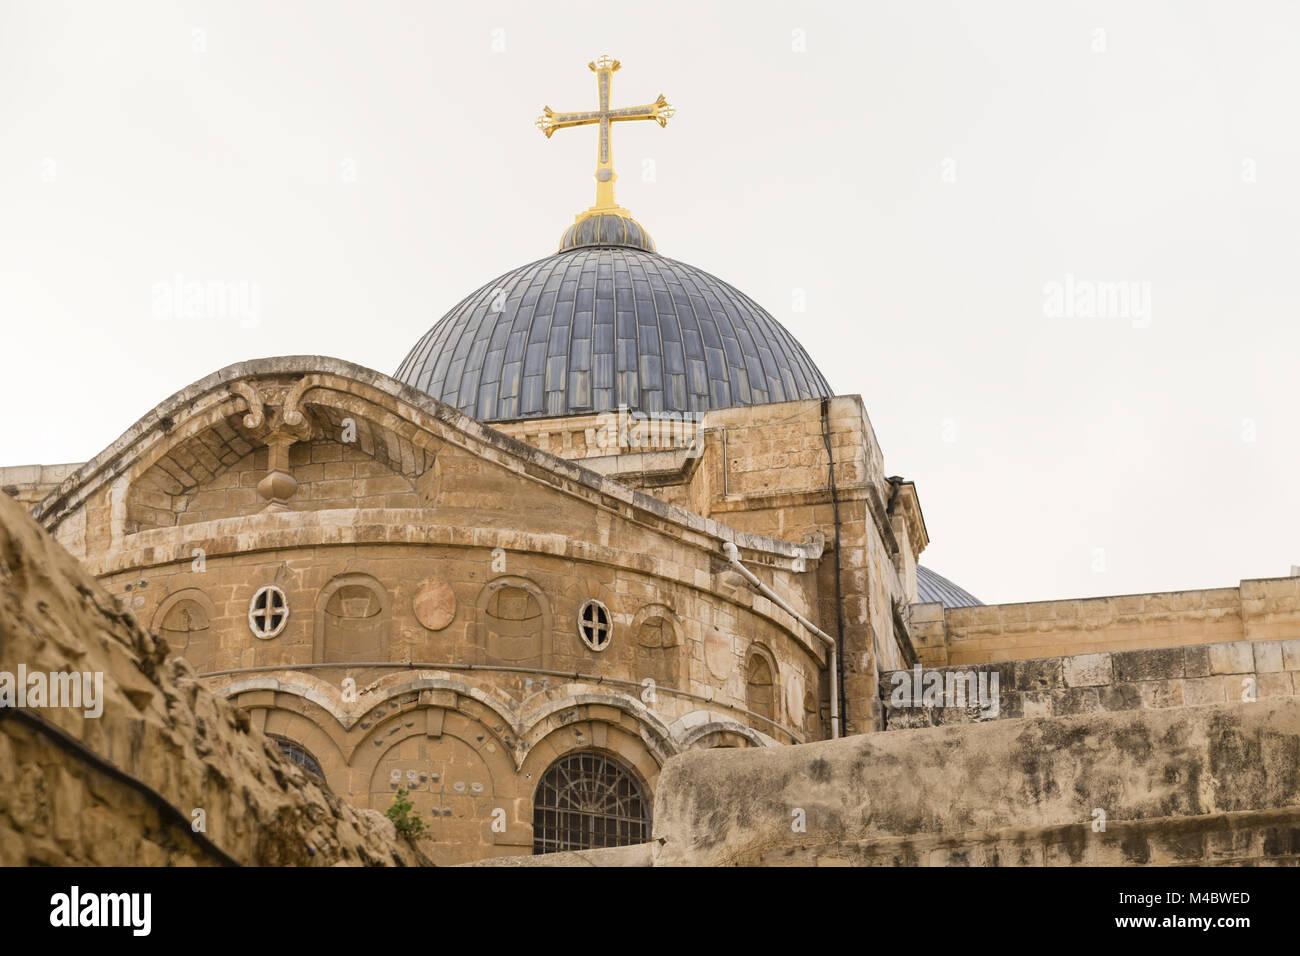 Church of the Holy Sepulchre, Jerusalem, Israel Stock Photo